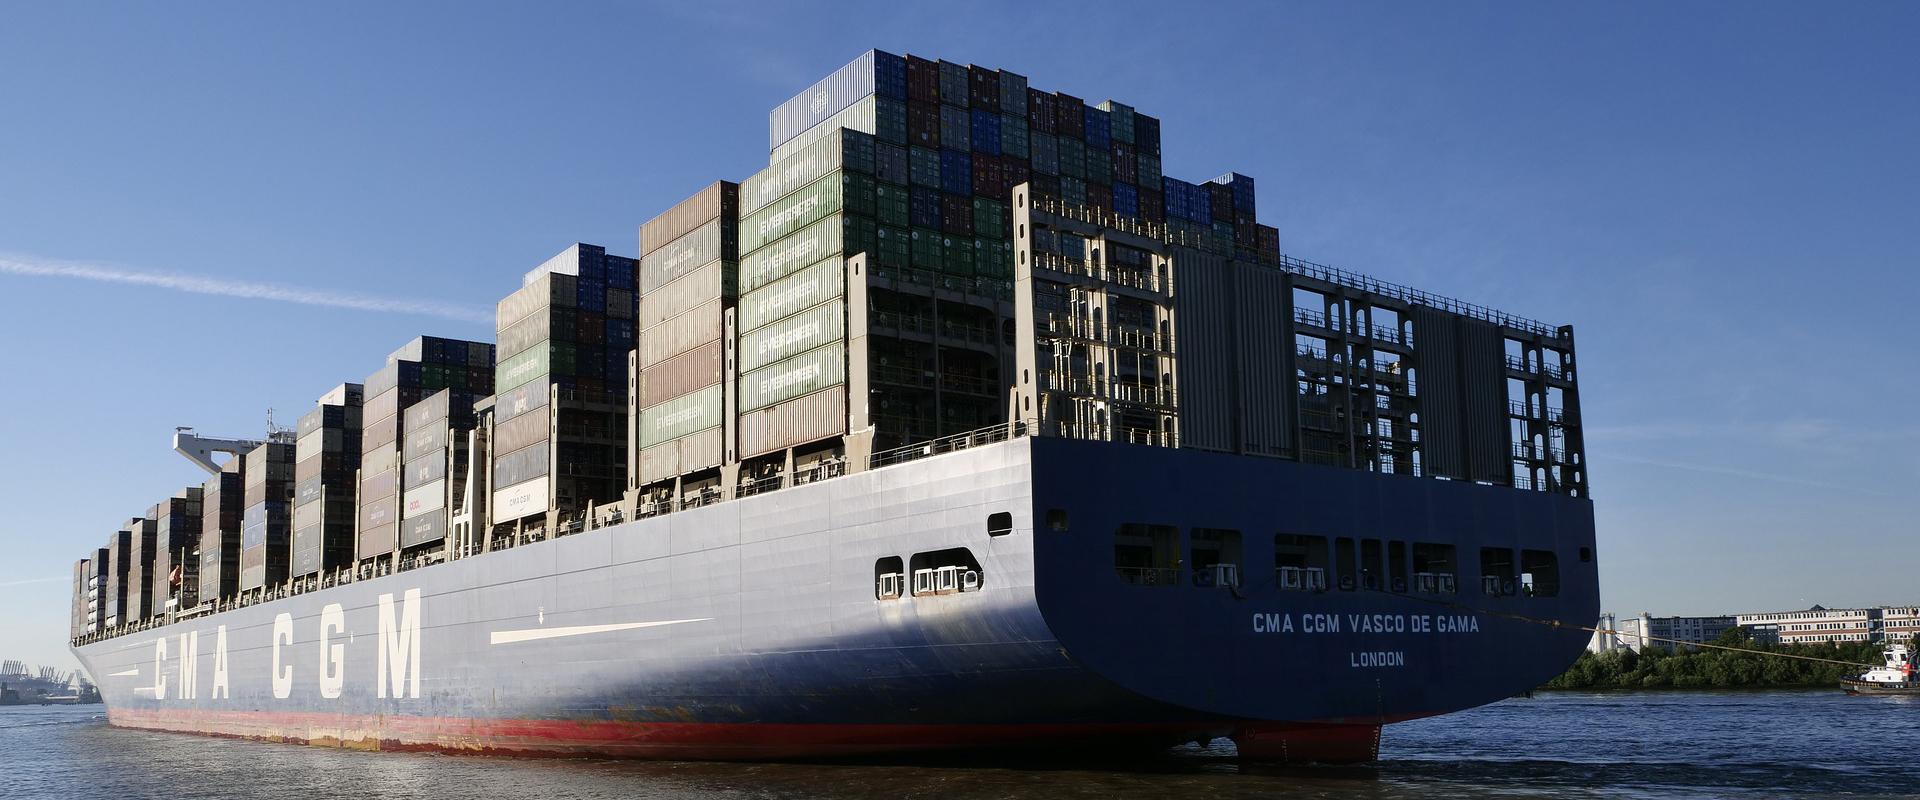 Zodiac Maritime Ltd